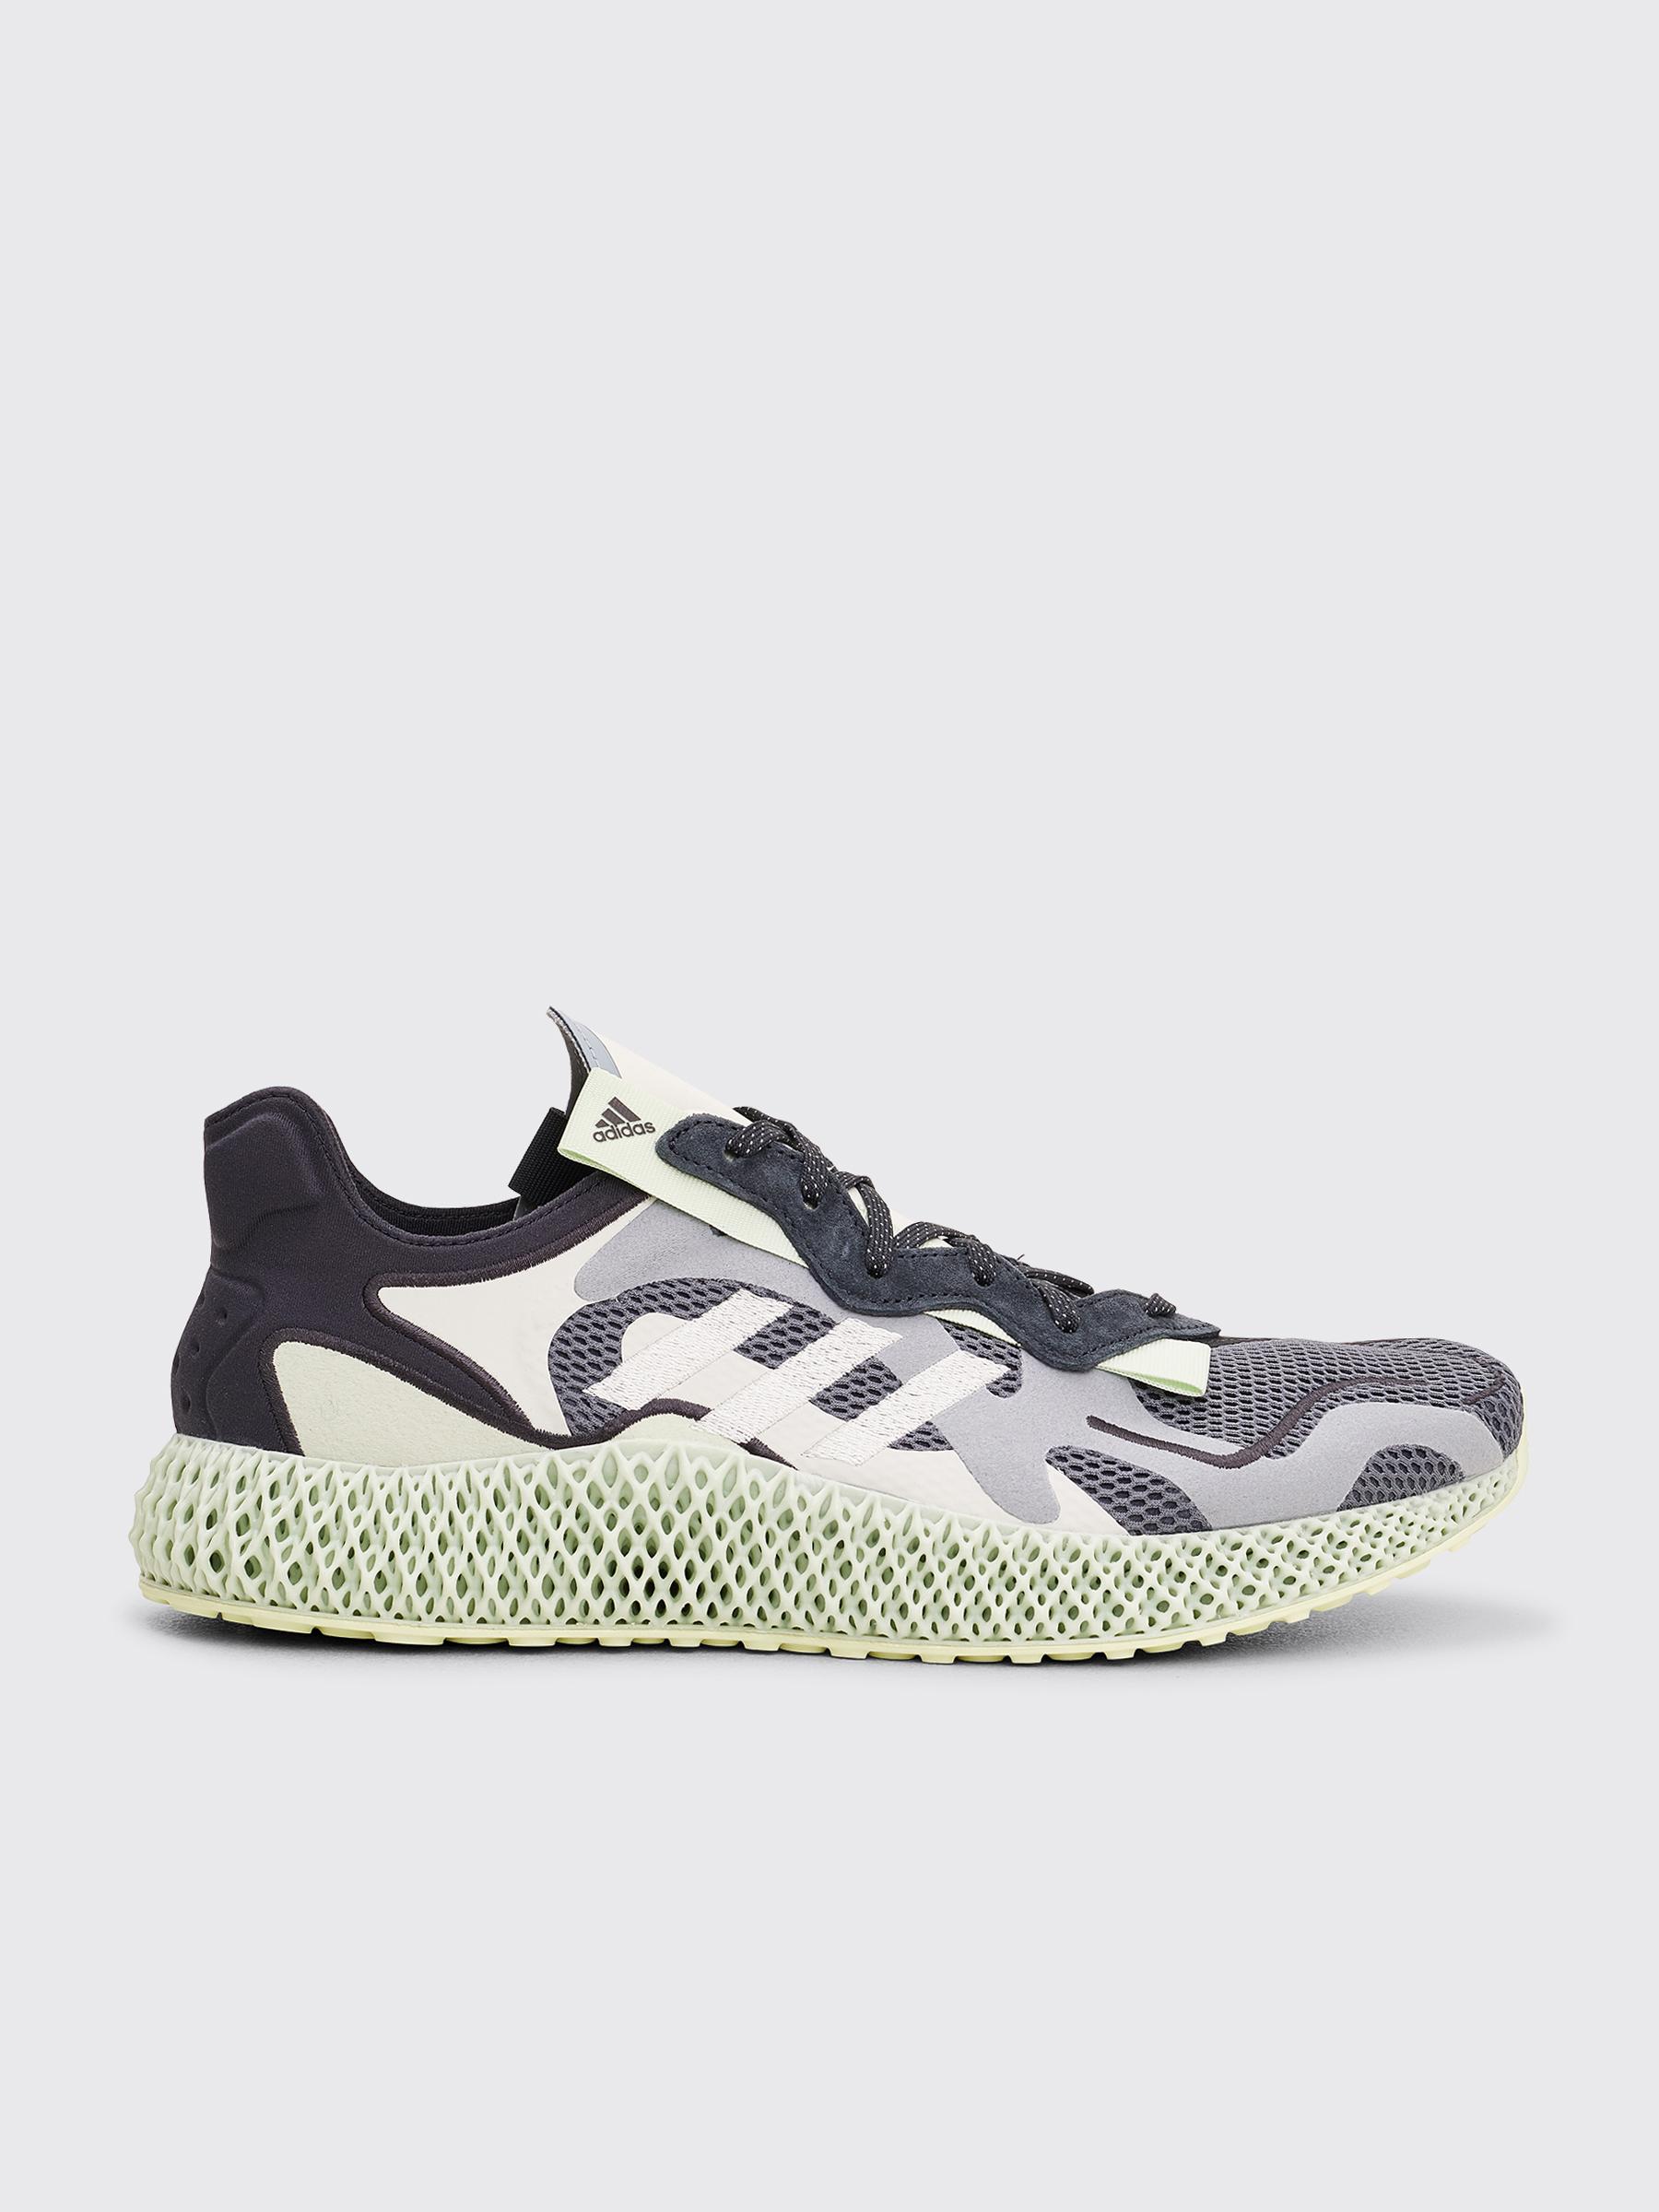 adidas Consortium Runner Evo 4D Onix